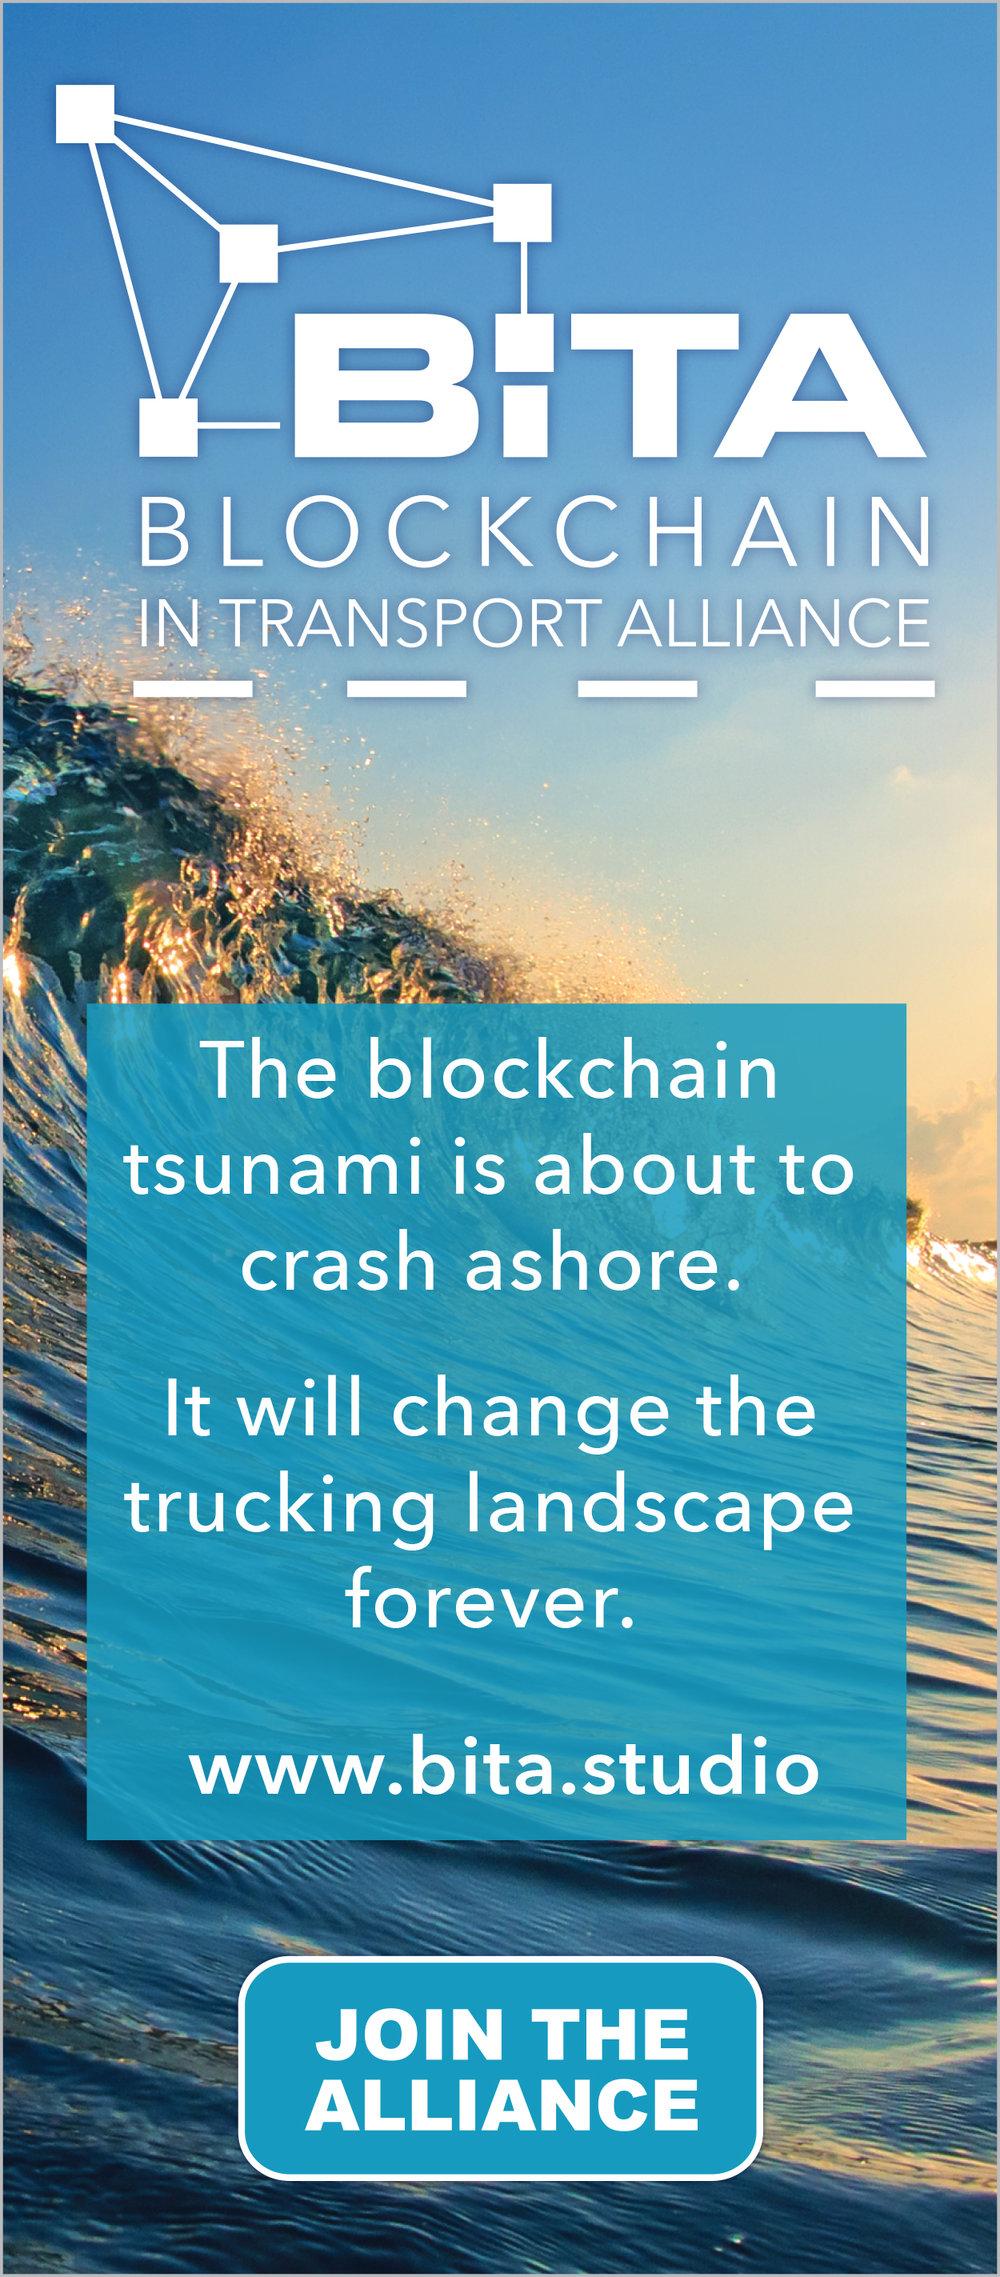 169-t18-ads-fw-banner-tsunami-revised2-112817.jpg